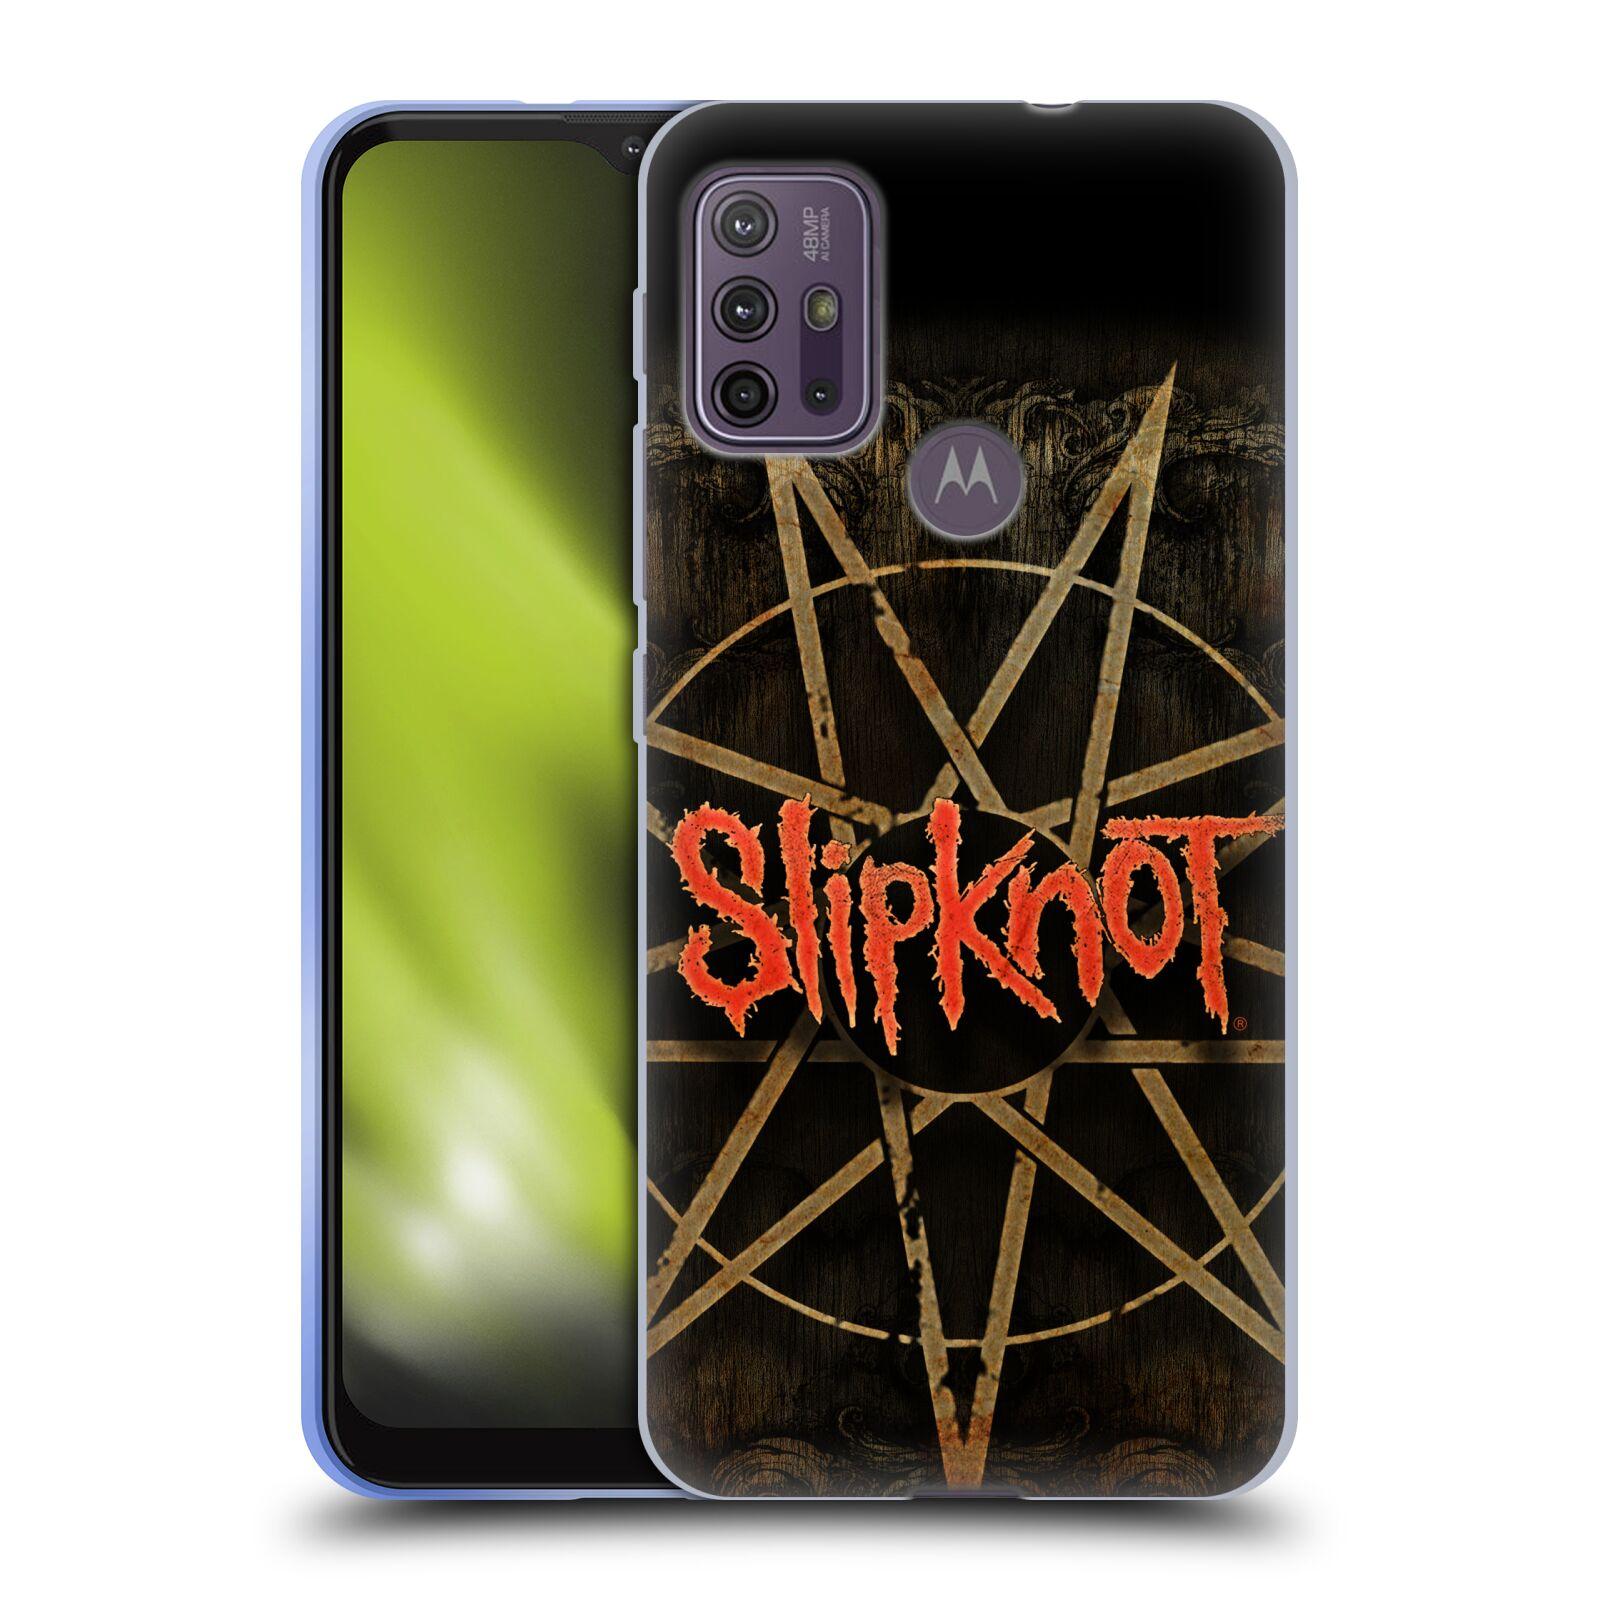 Silikonové pouzdro na mobil Motorola Moto G10 / G30 - Head Case - Slipknot - Znak